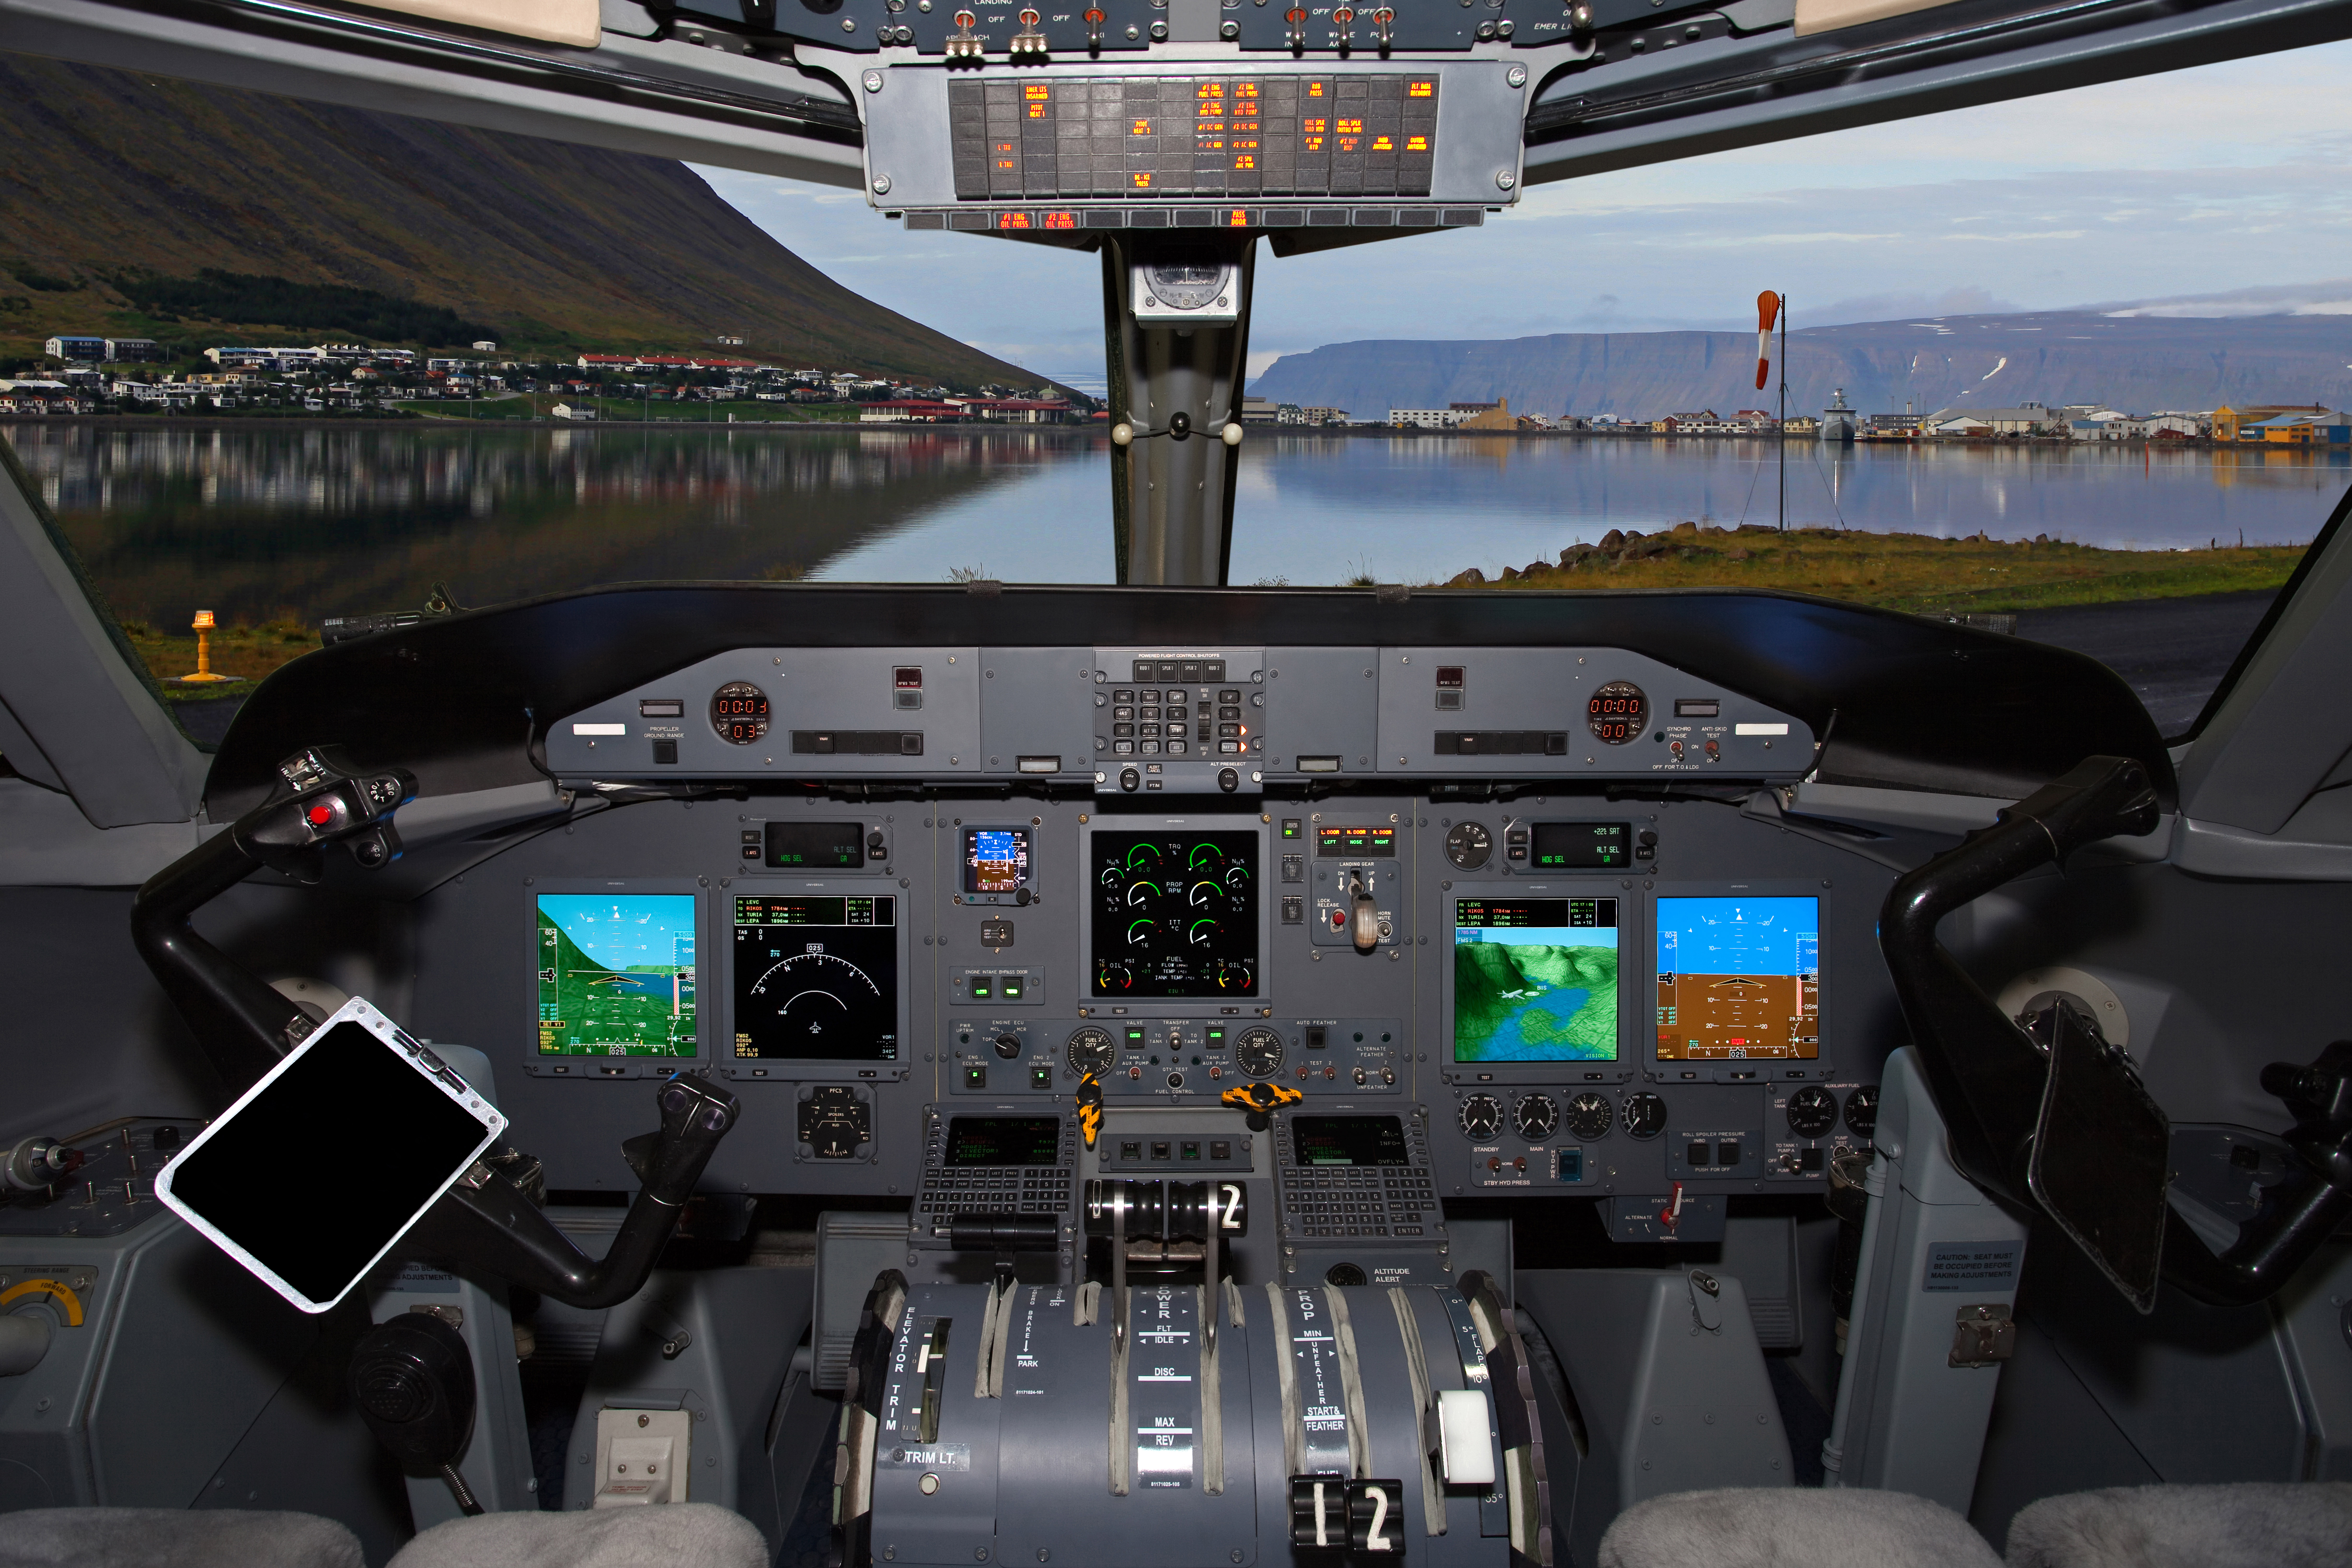 Field Aviation's EFI-890R Flight Deck Modernization